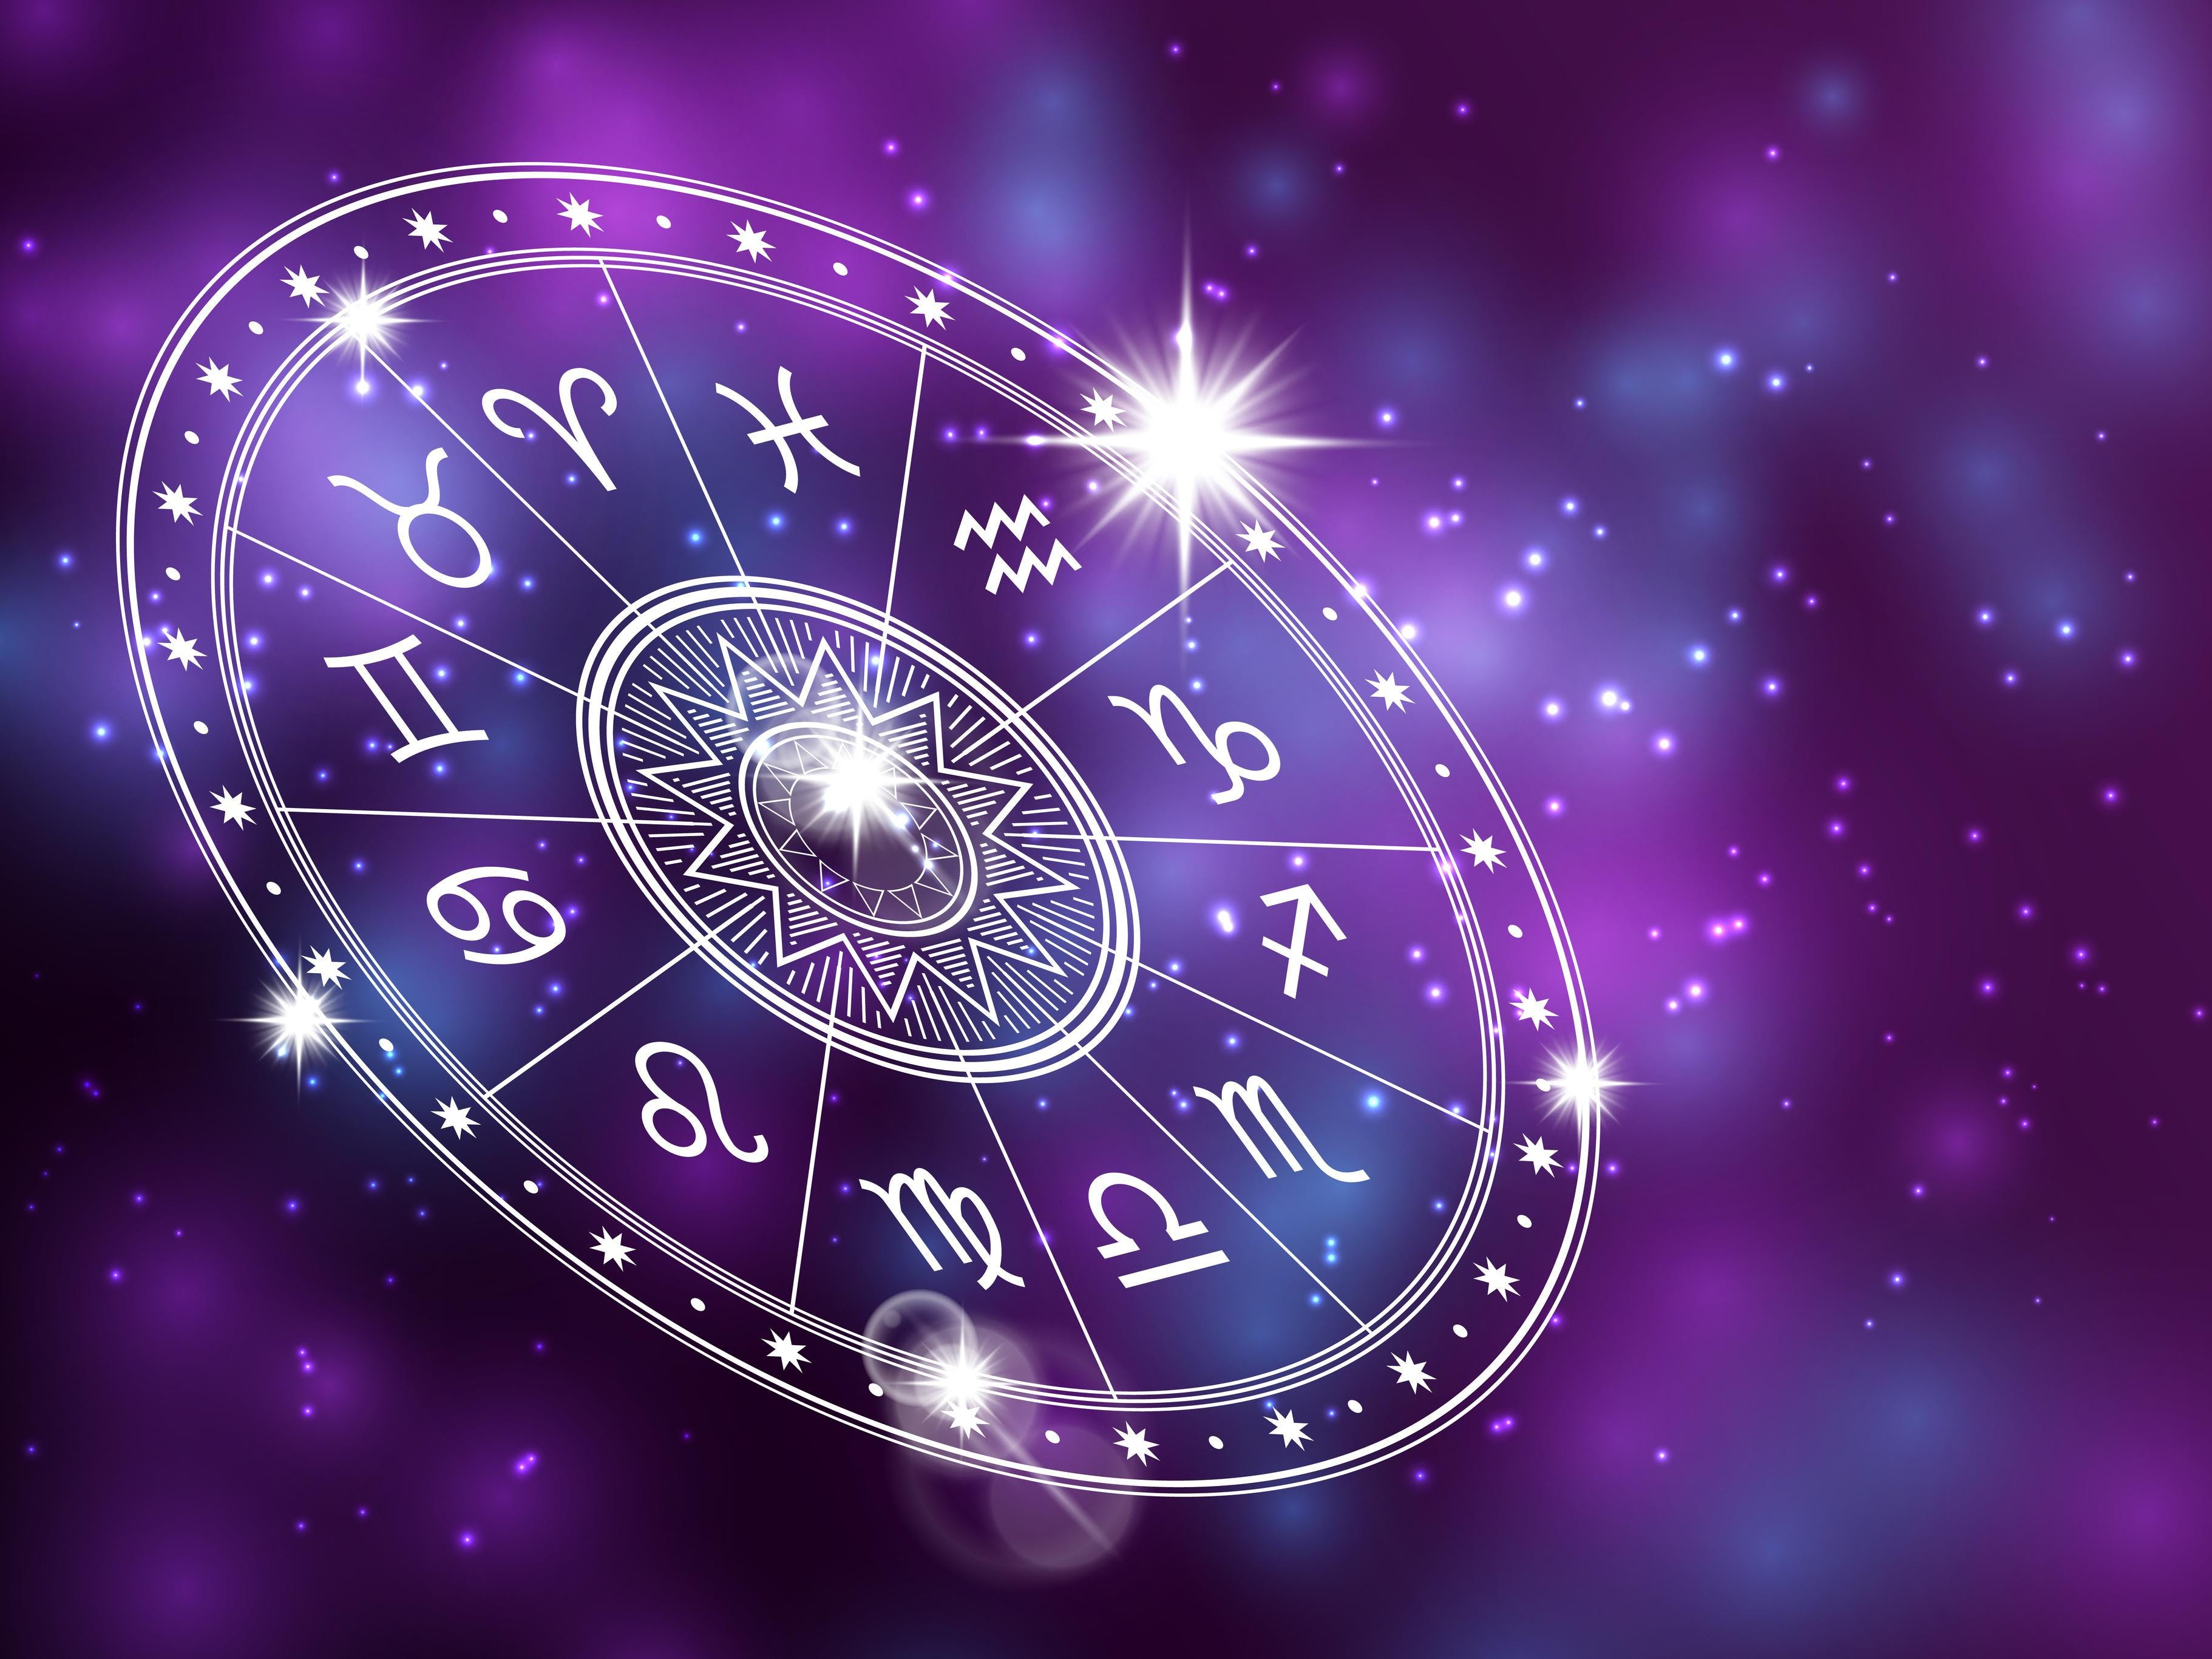 Wine, Women & Astrology Night: Let's Take a S